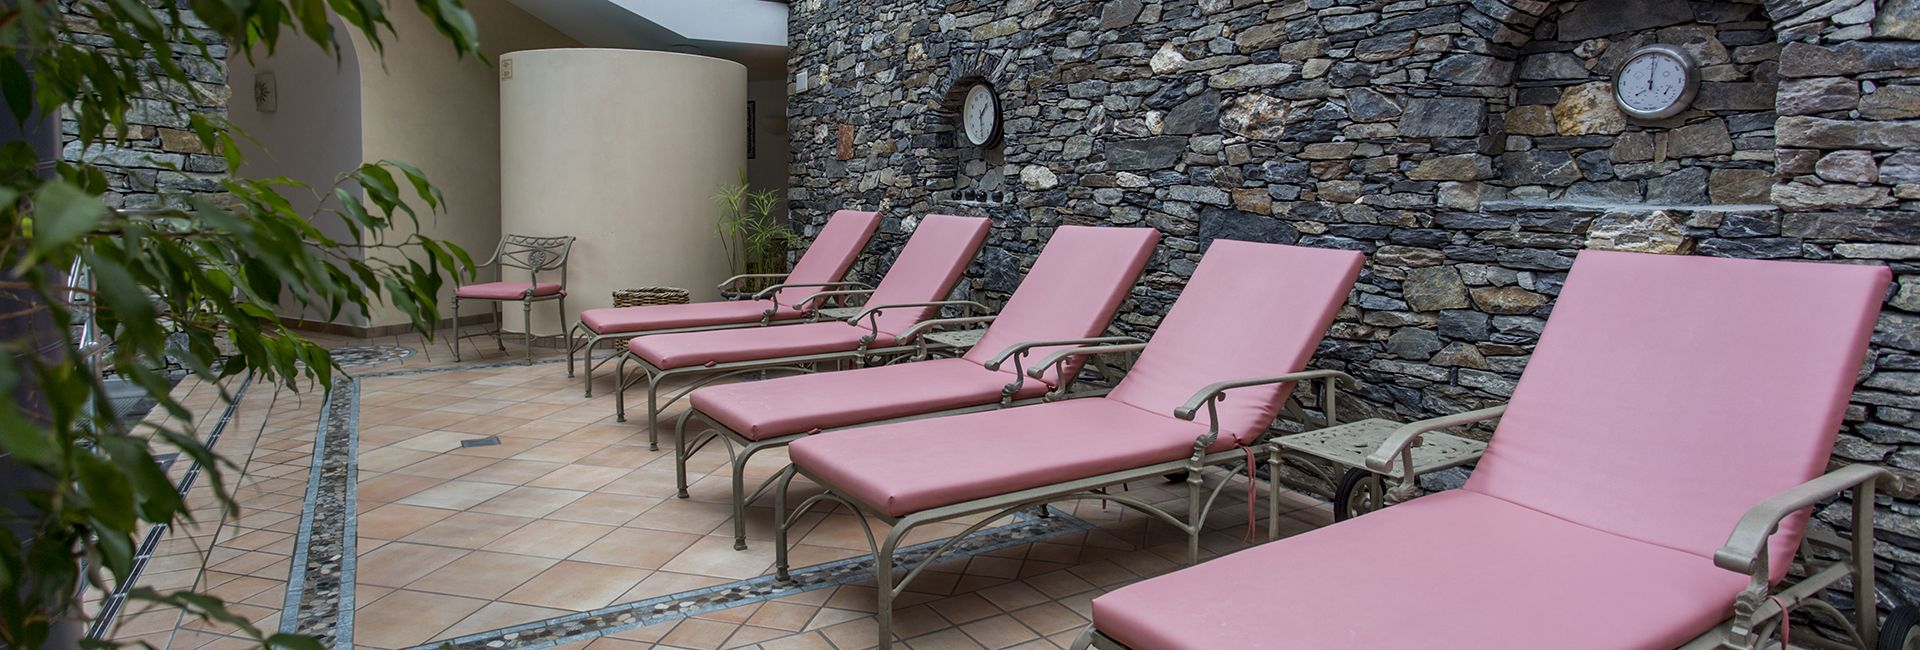 Hotel Cresta Wellness